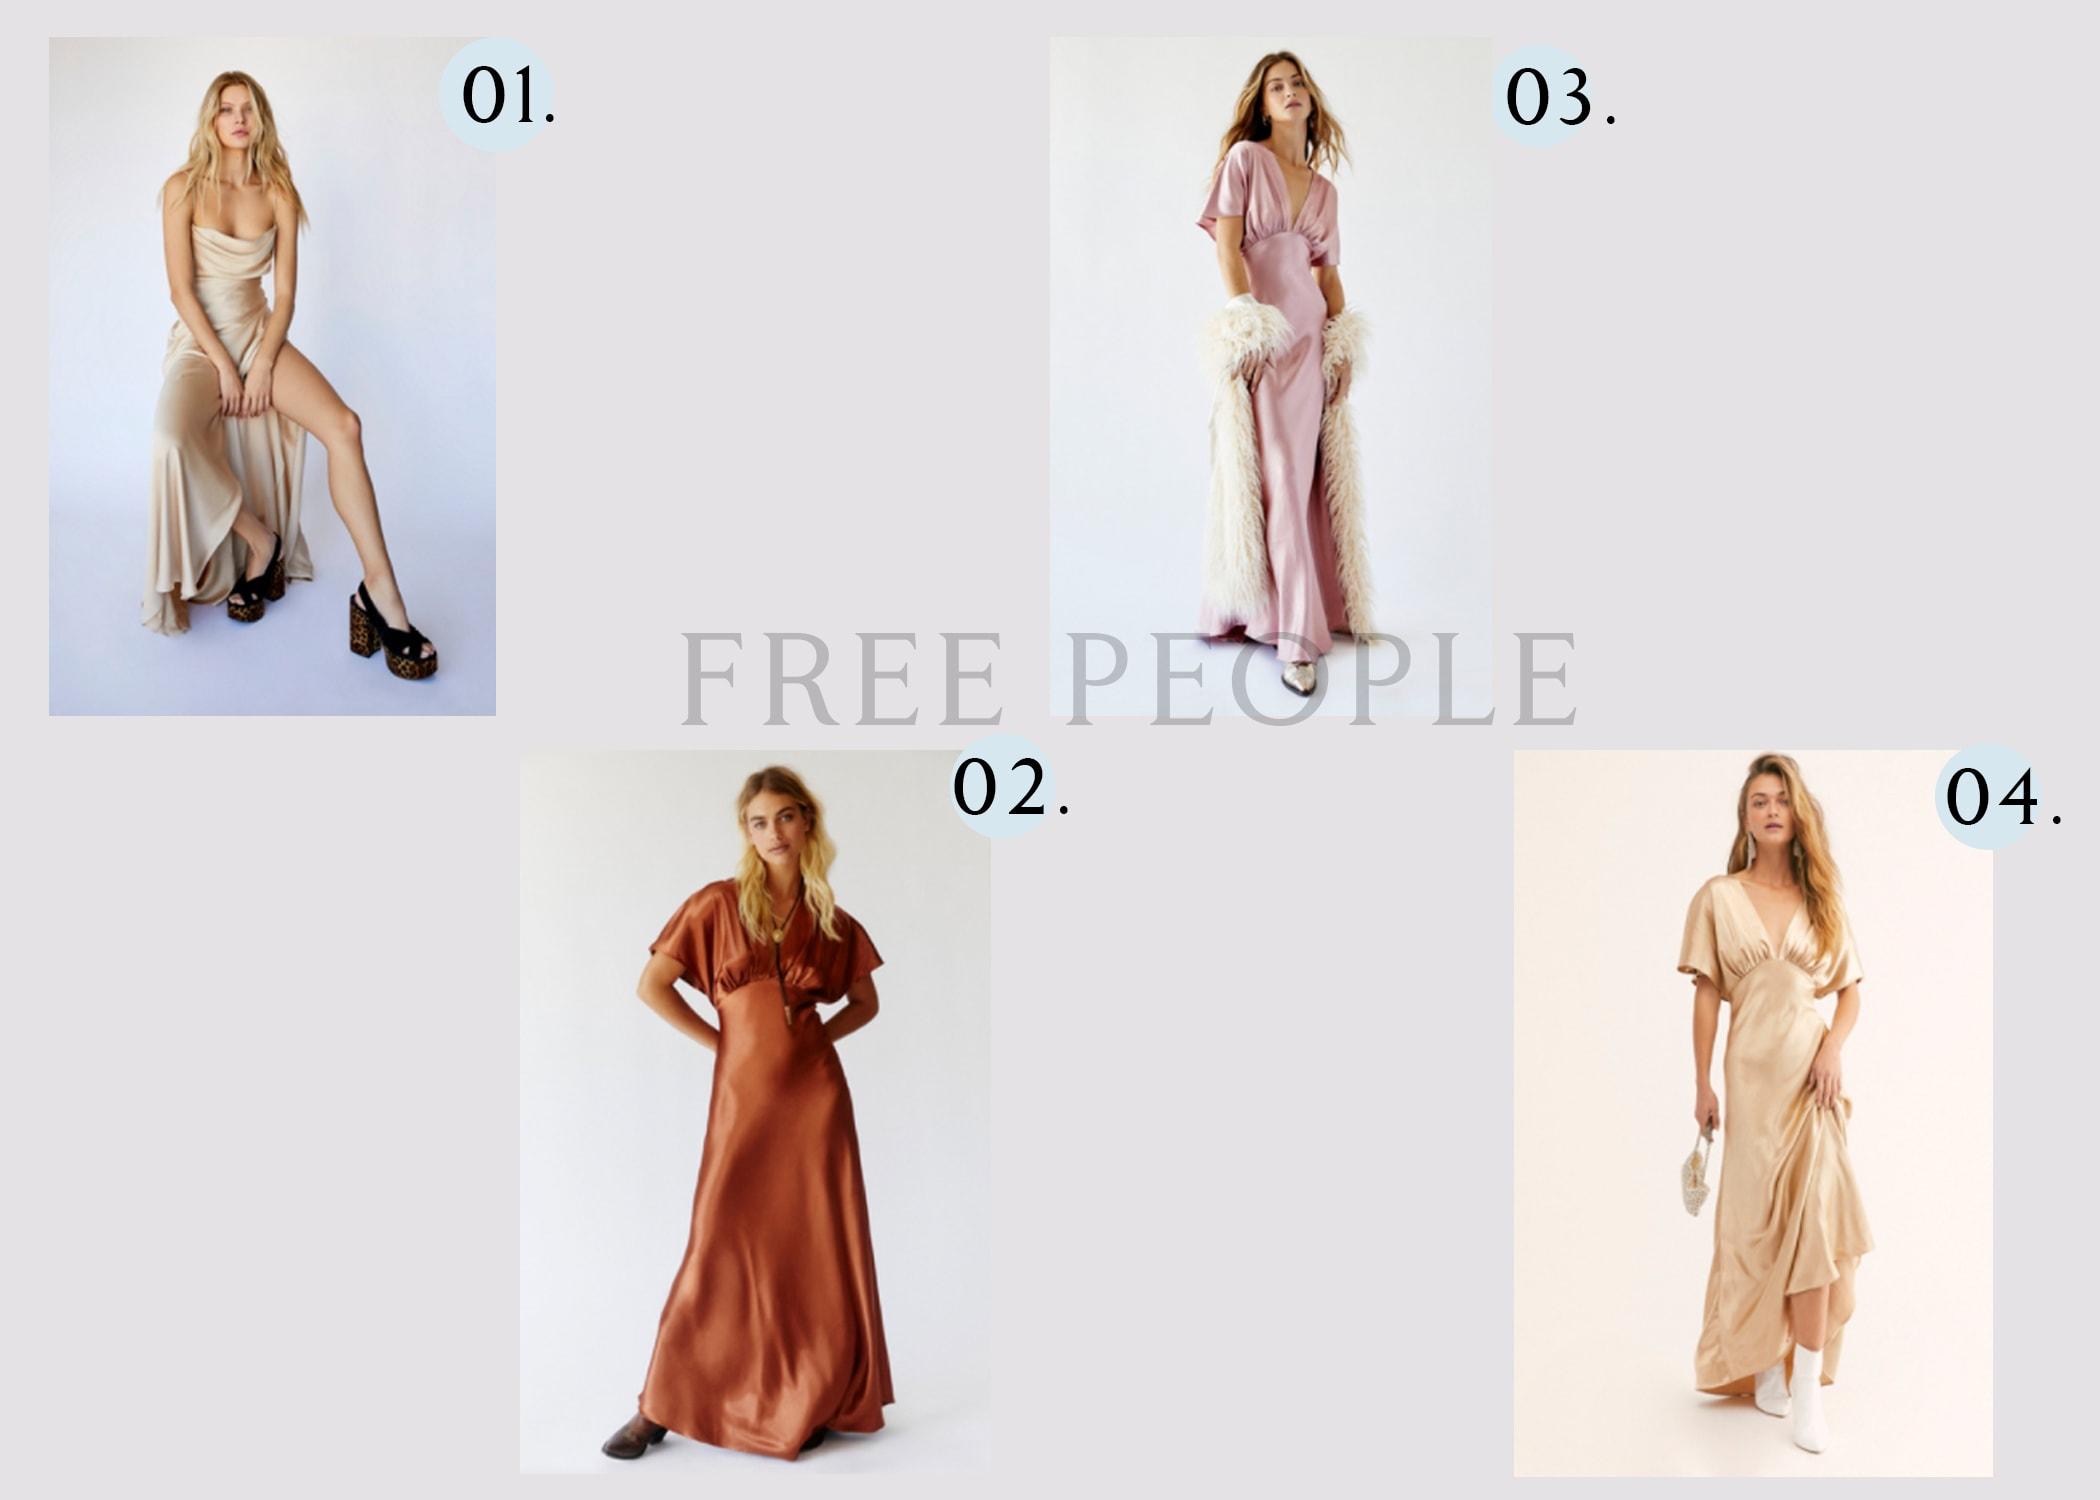 Free People clothing brand bridesmaid dresses.